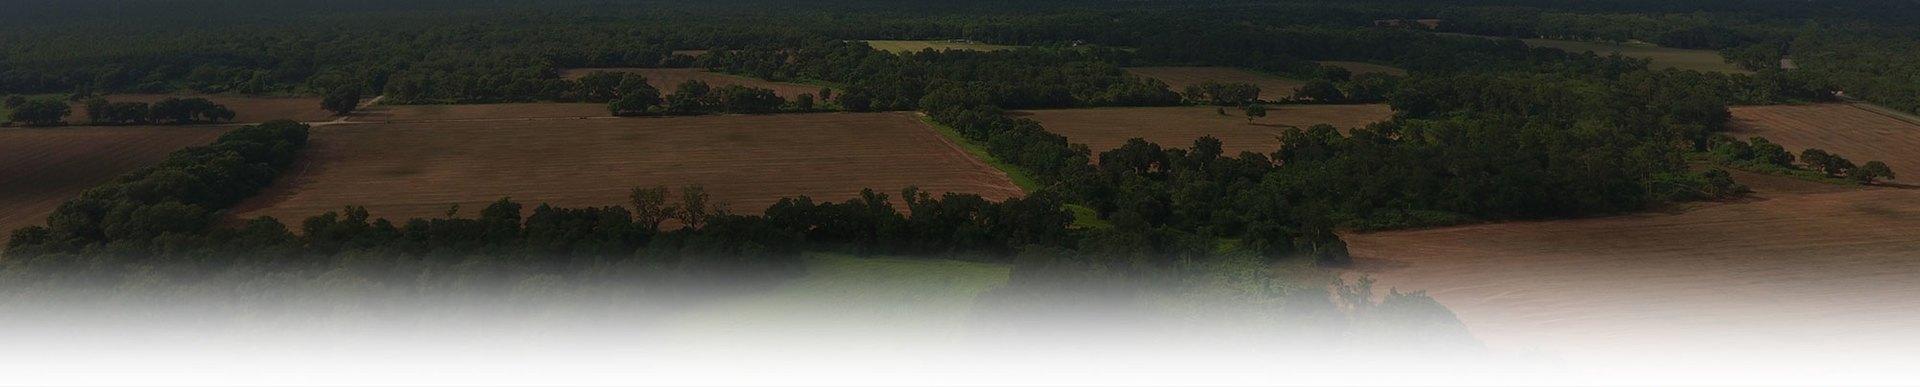 Listings - Alabama Land Agent